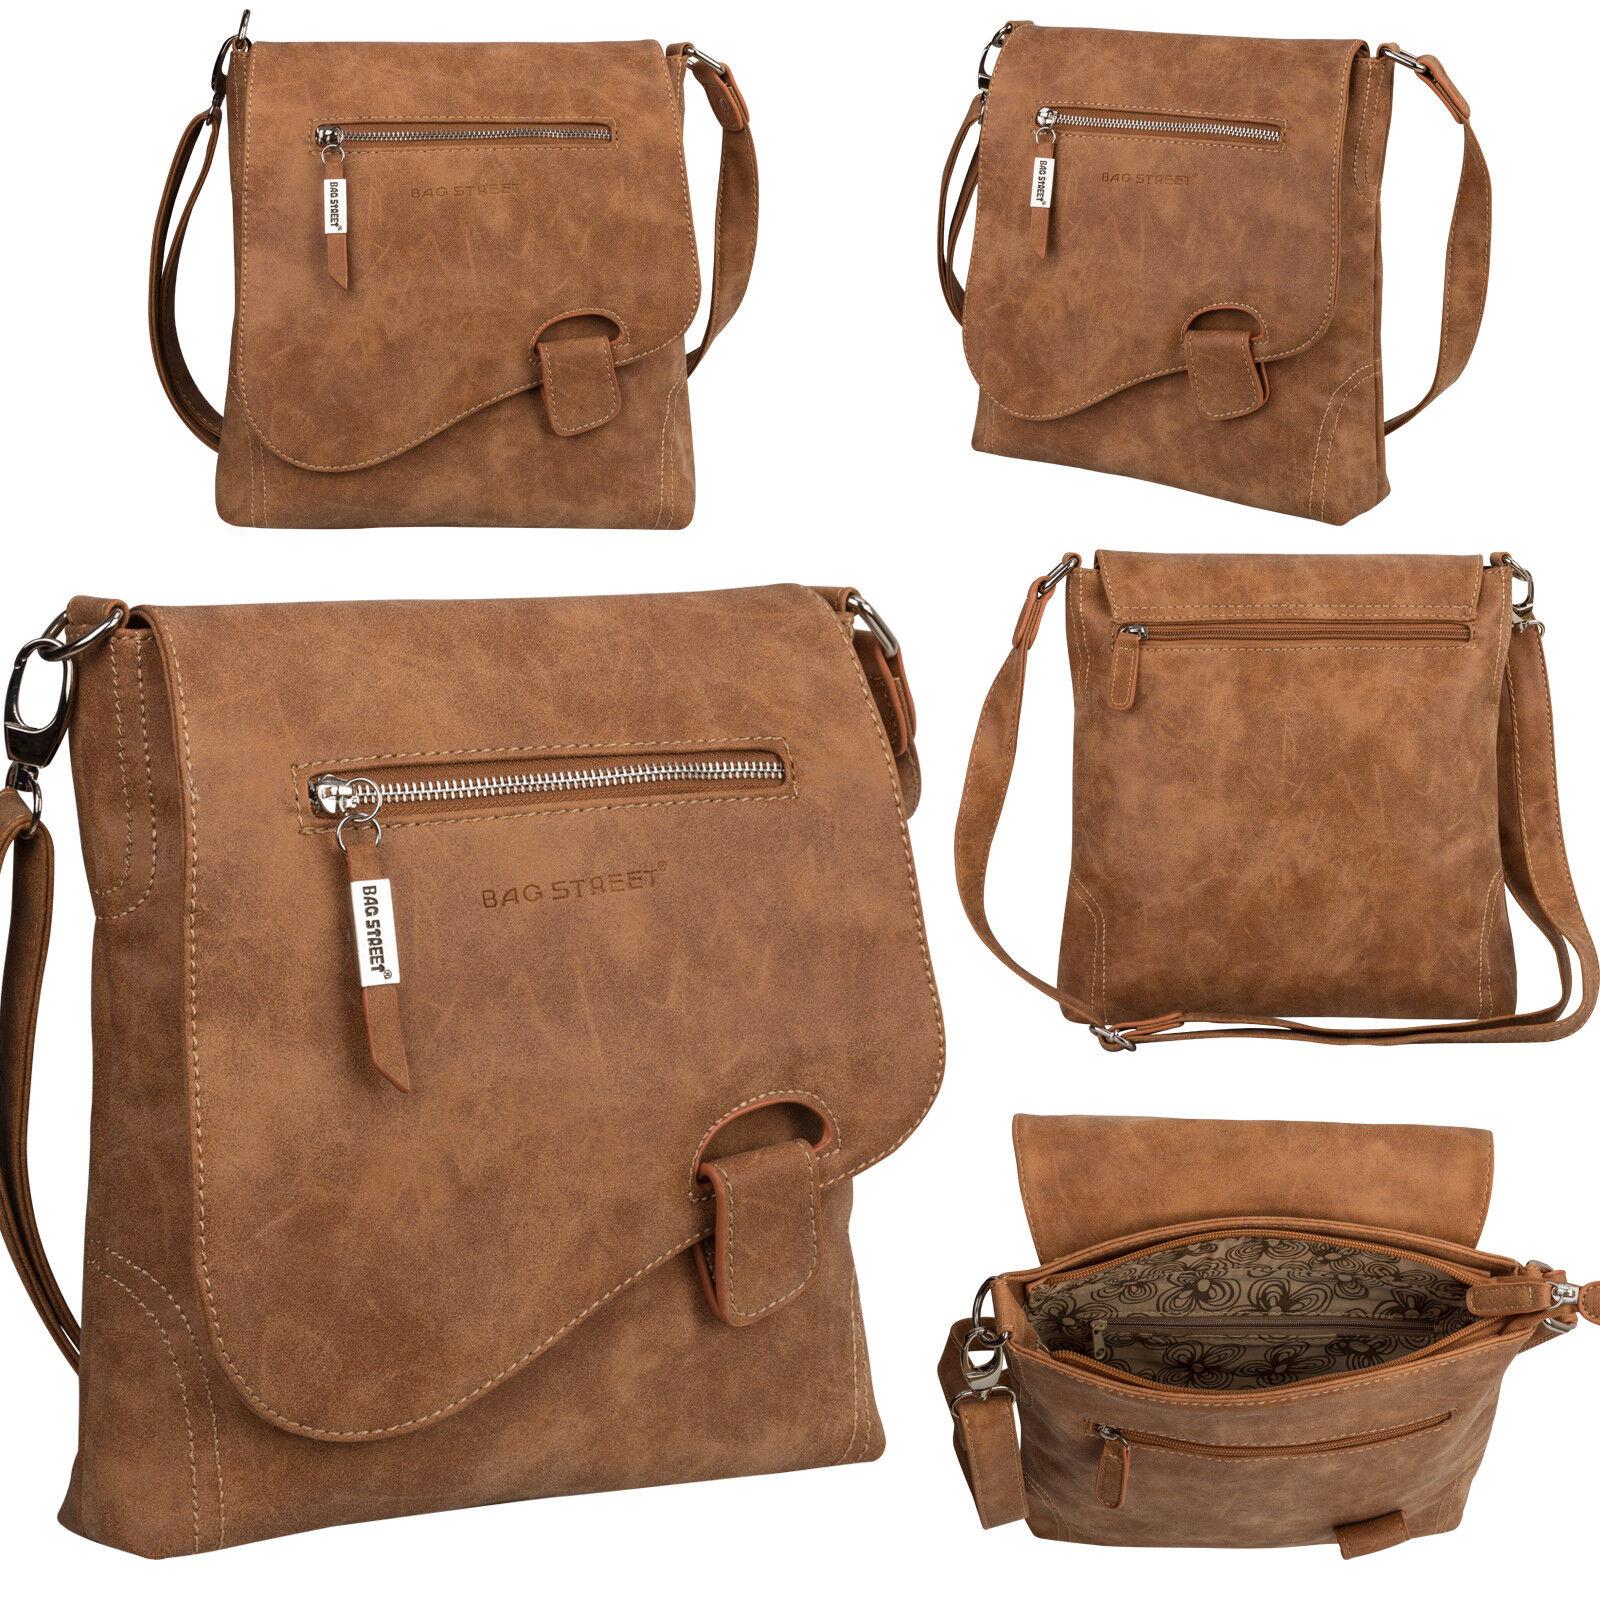 Bag Street Damentasche Umhängetasche Handtasche Schultertasche K2 T0104 Cognac